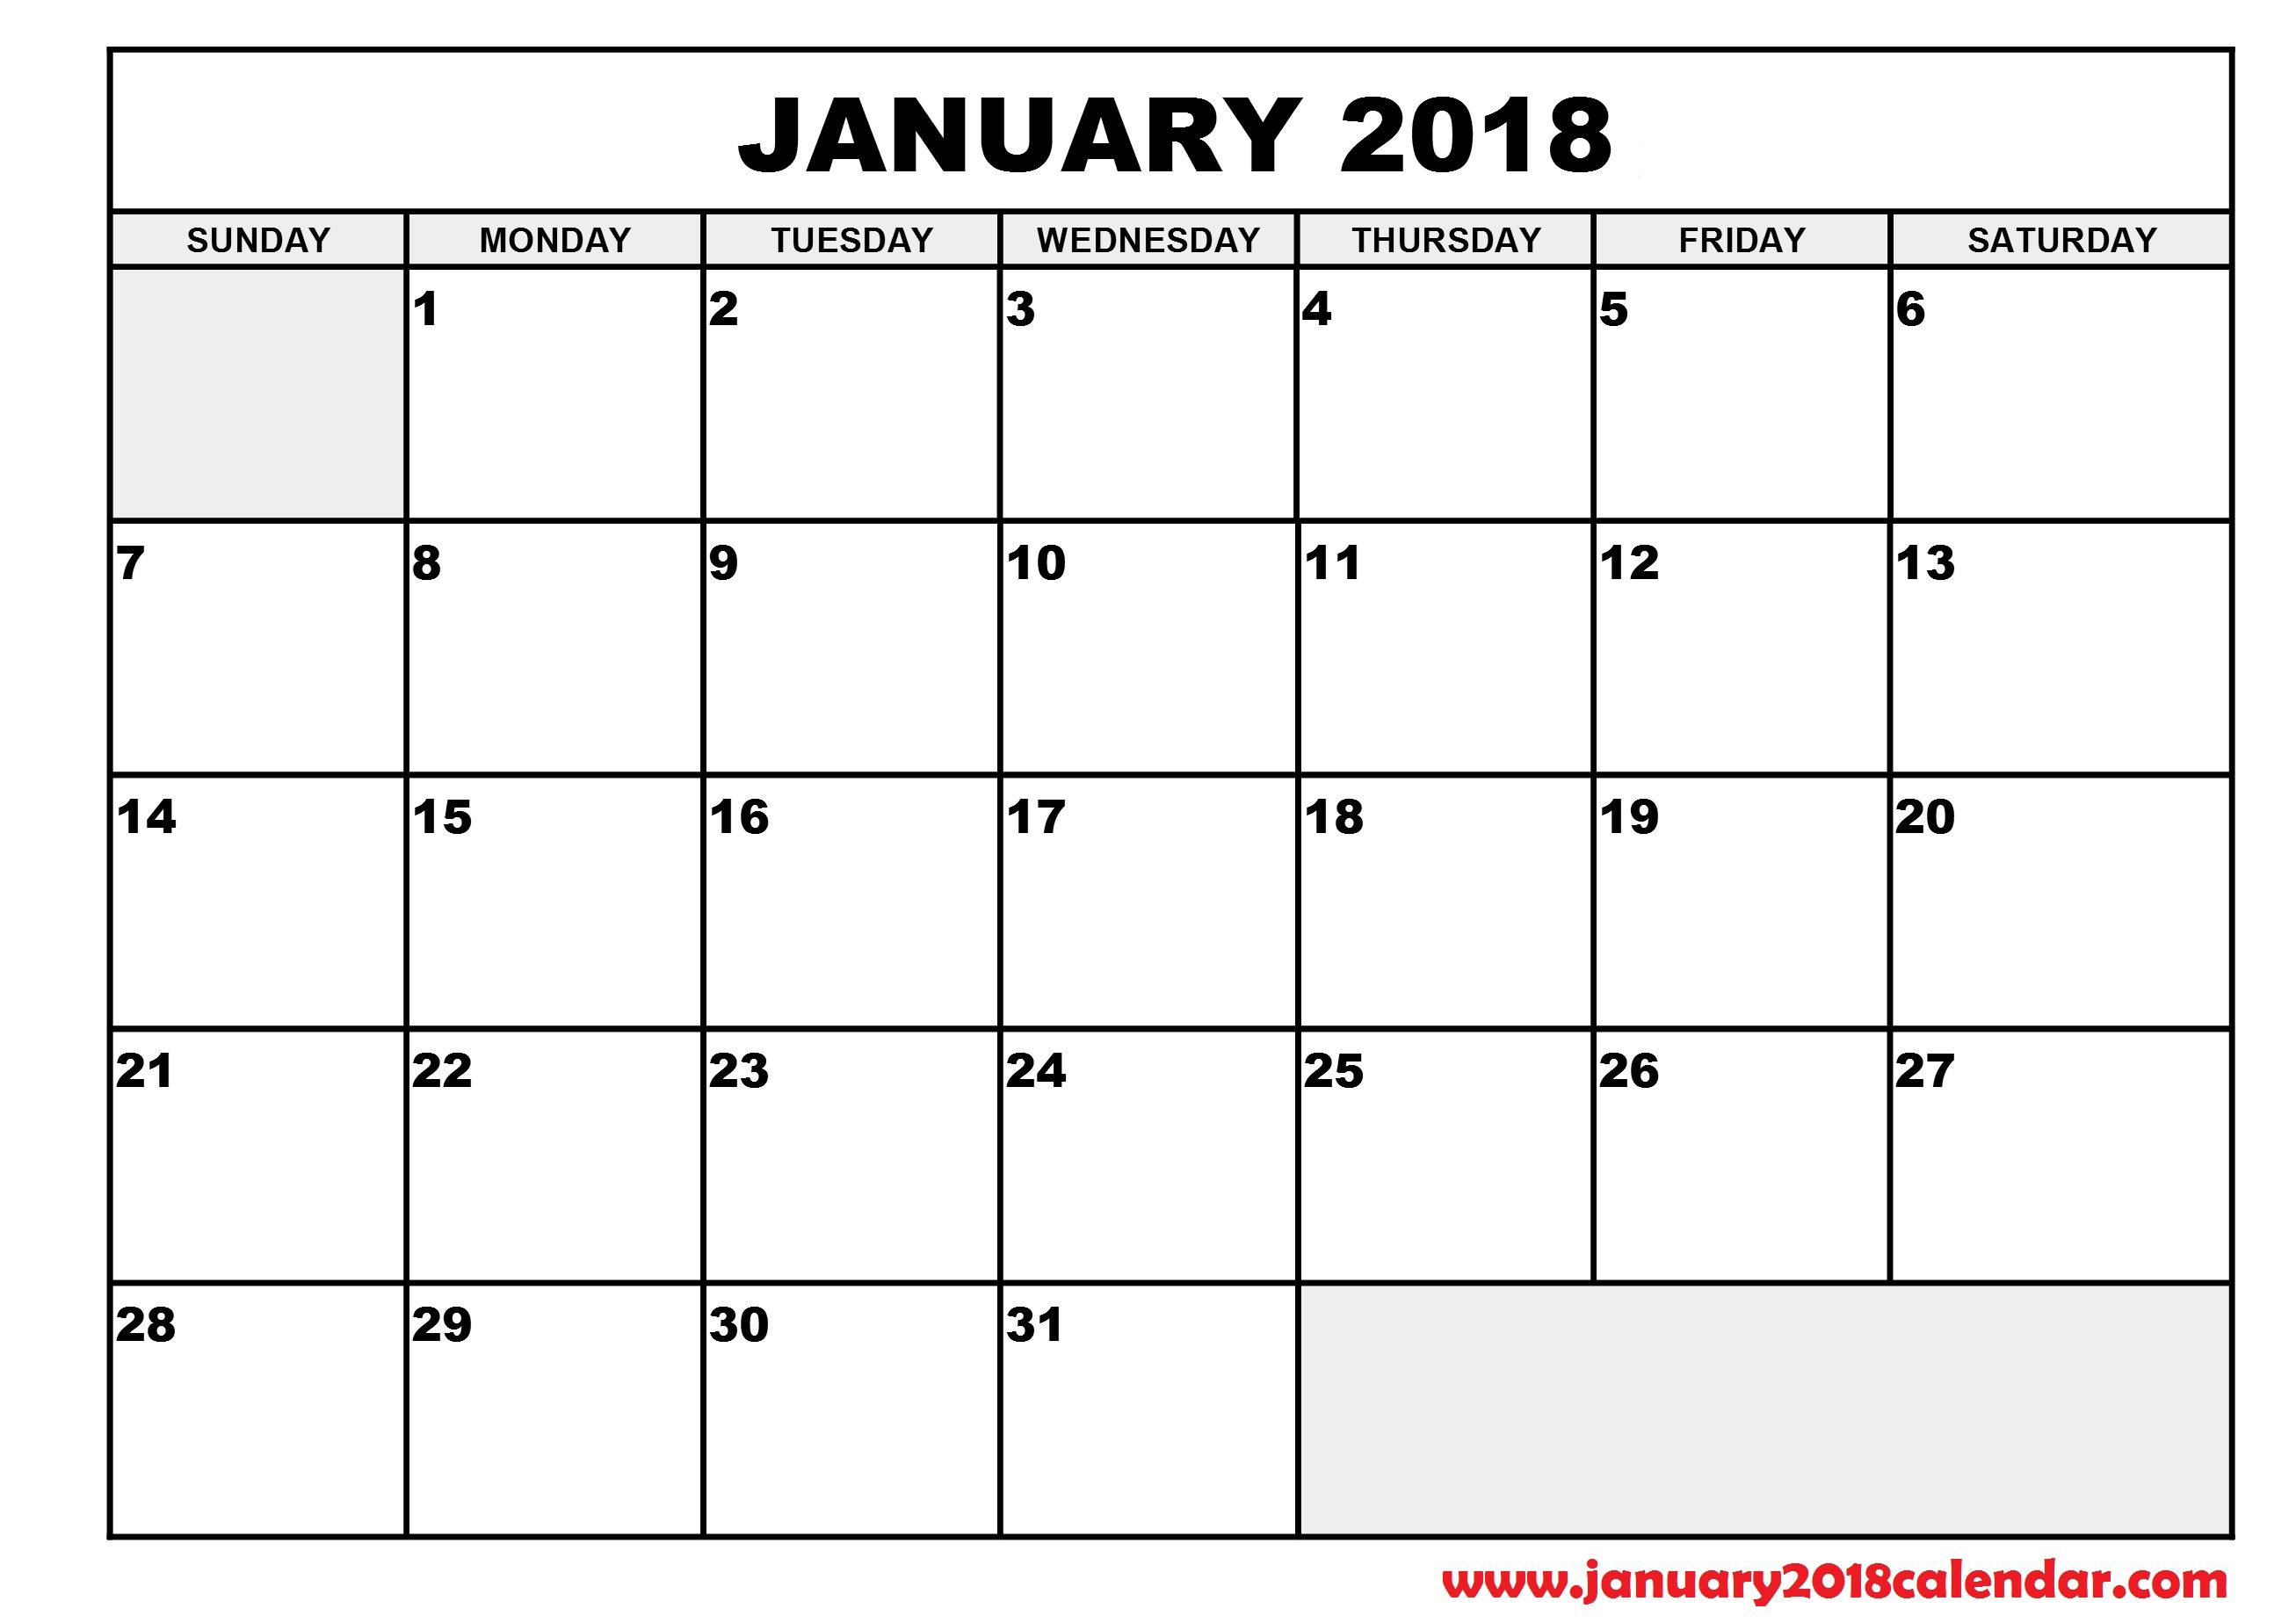 Calendar Planner 2018 Excel : January calendar excel